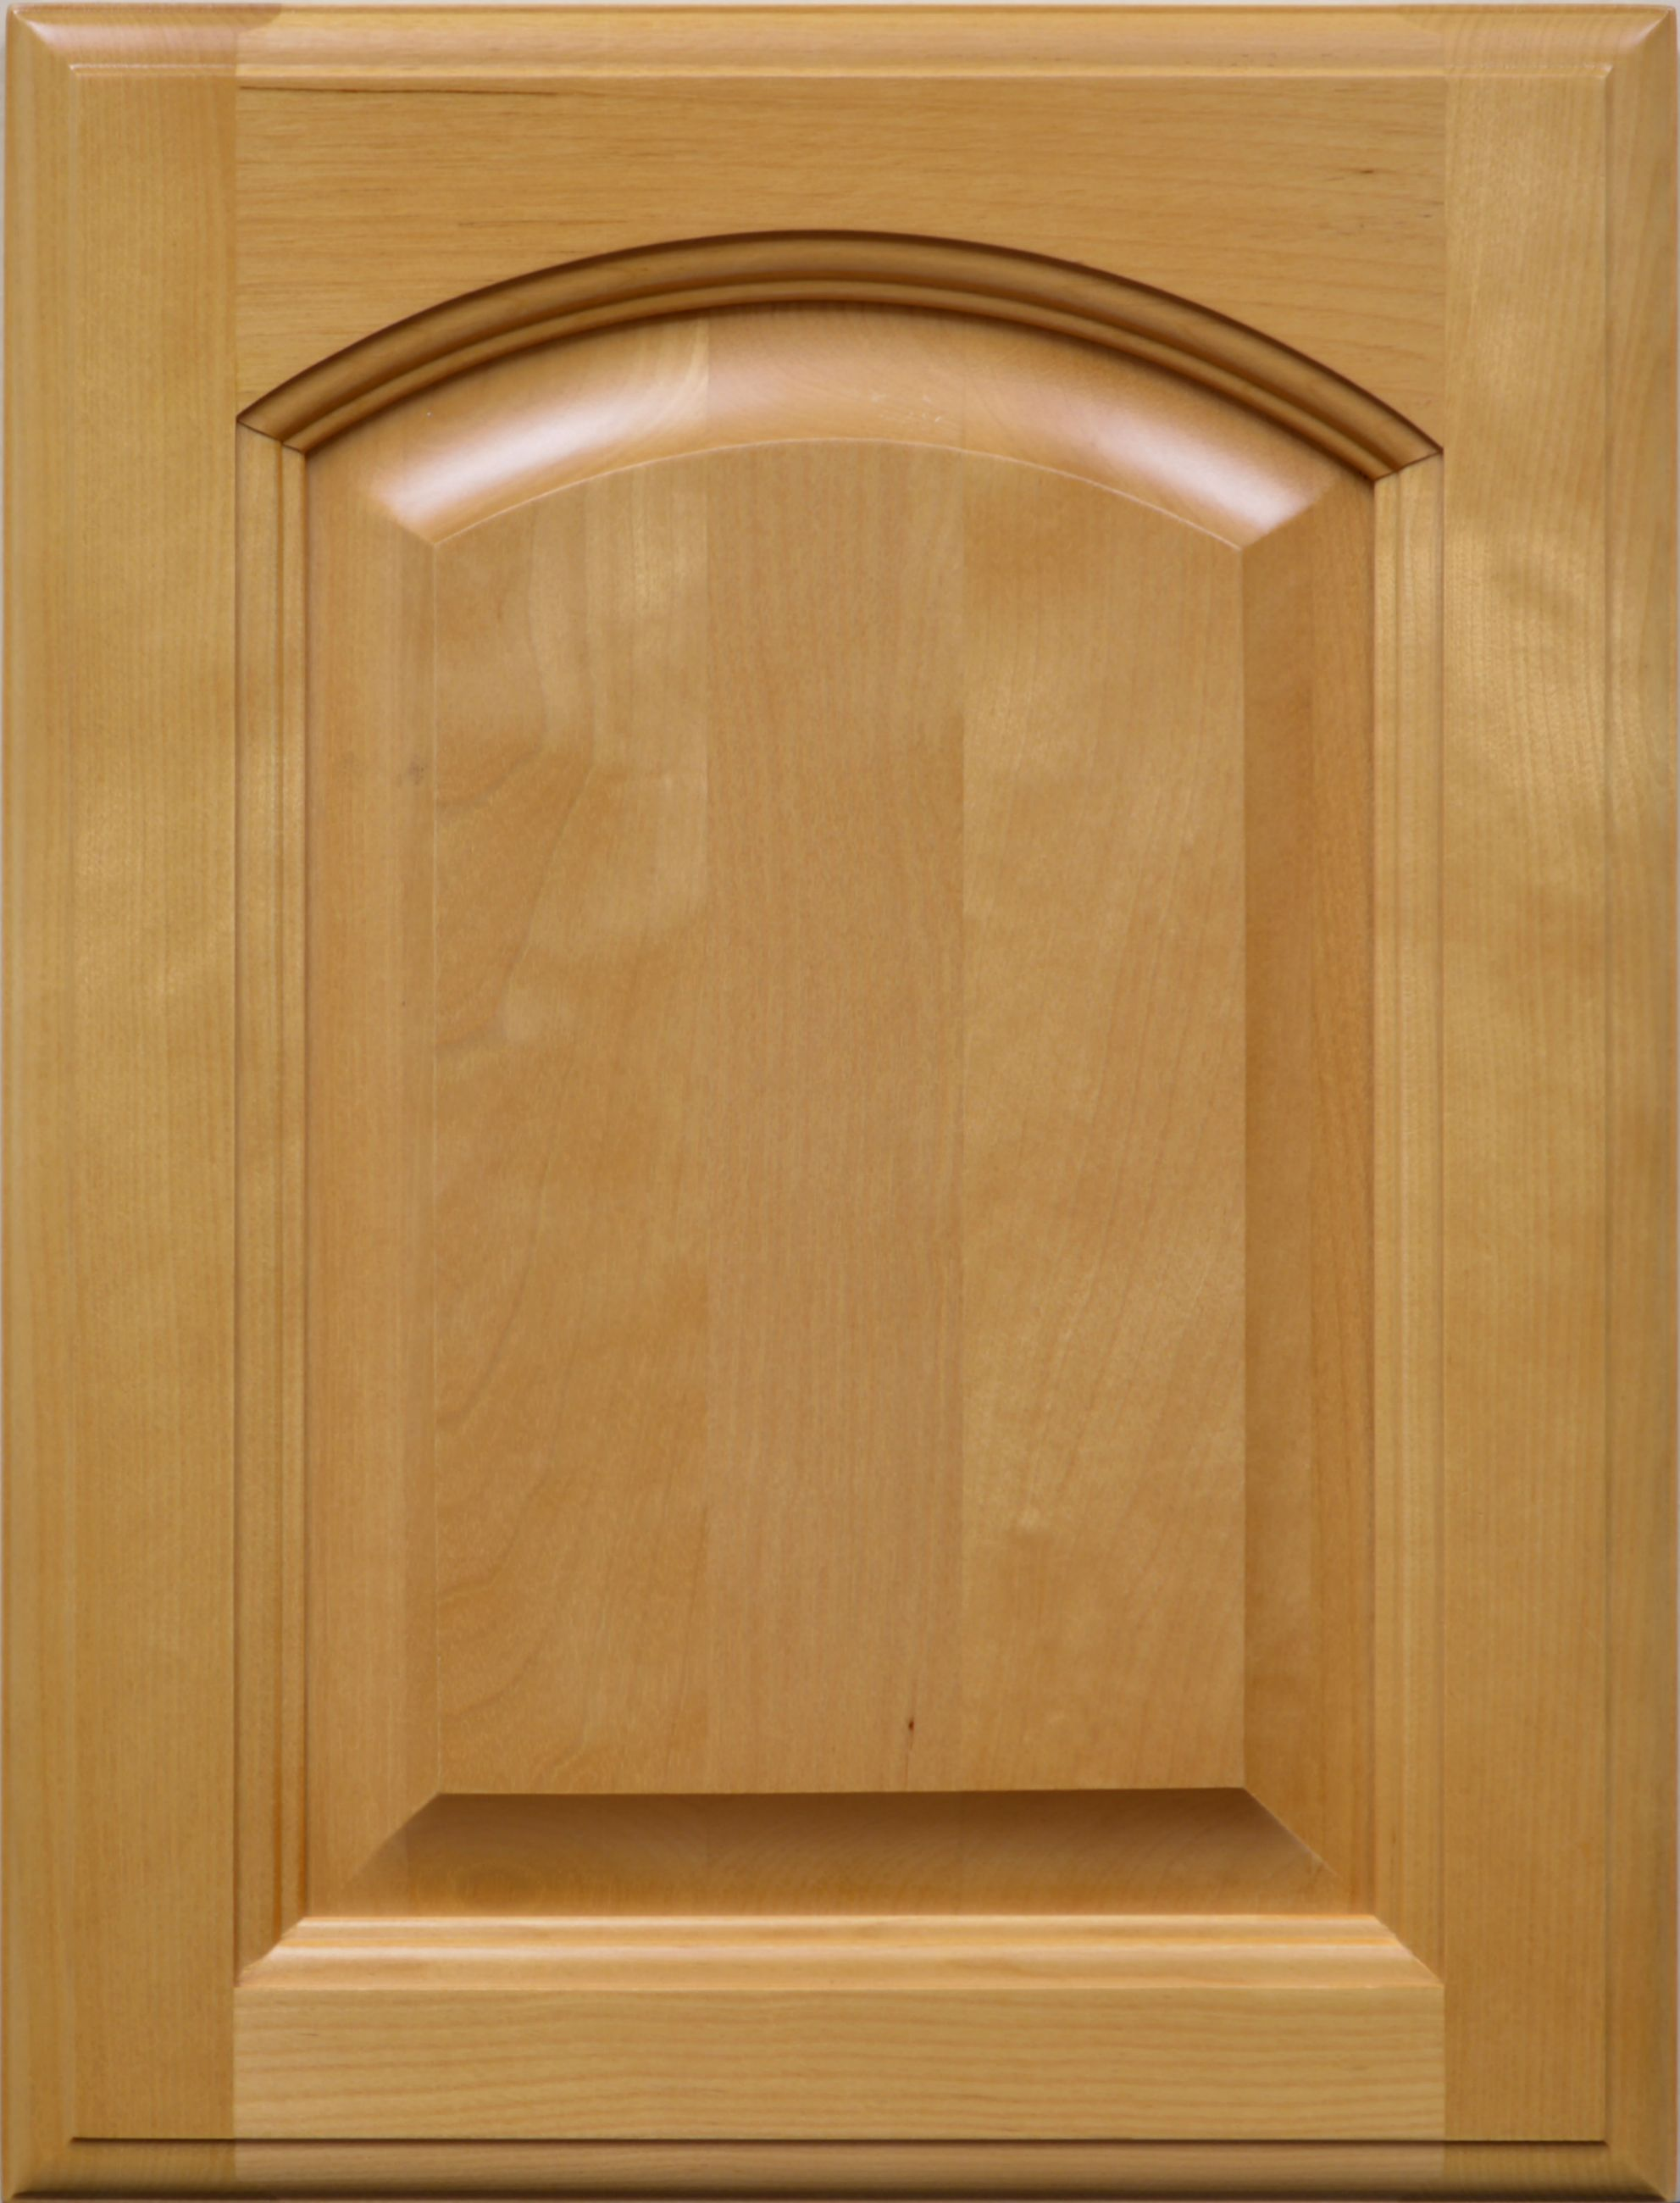 Concord Raised Cathedral Custom Cabinet Doors Cabinet Door Replacement Cabinet Doors Custom Cabinet Doors